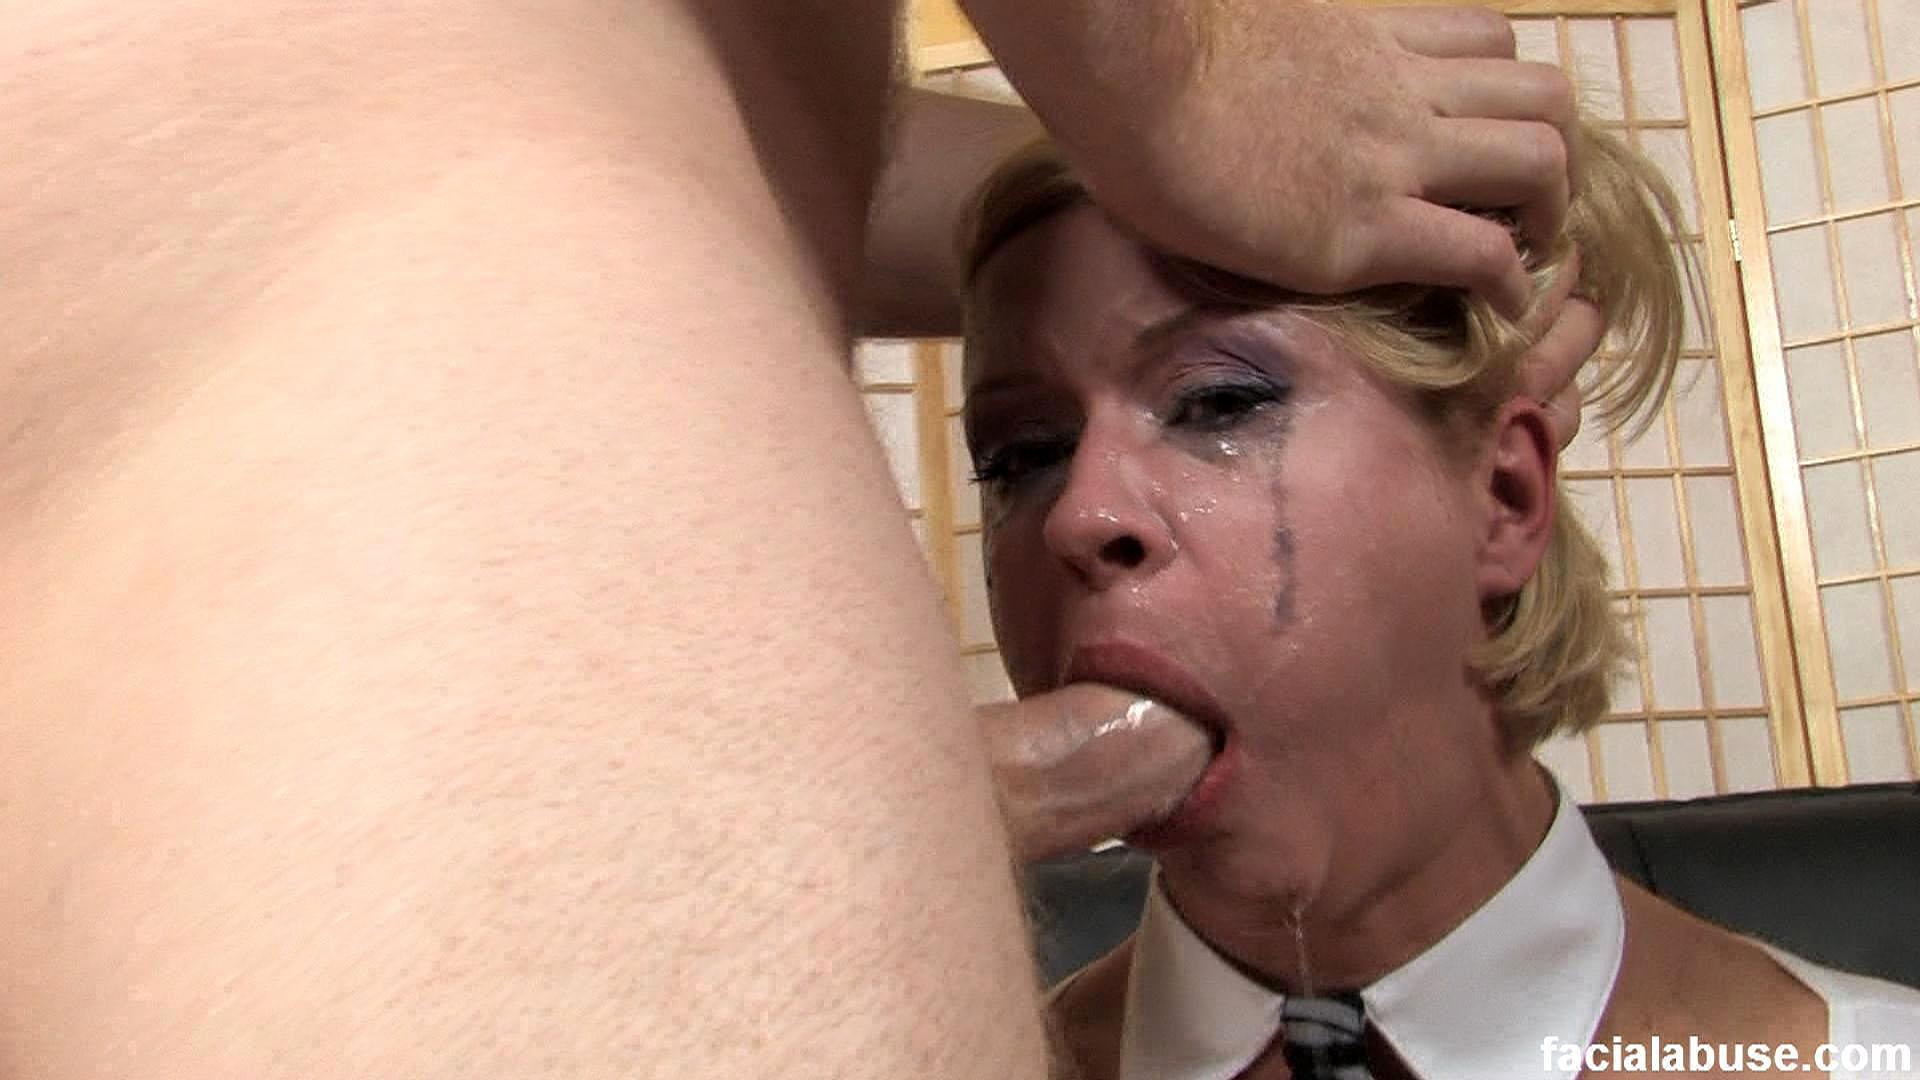 bravo porn pic